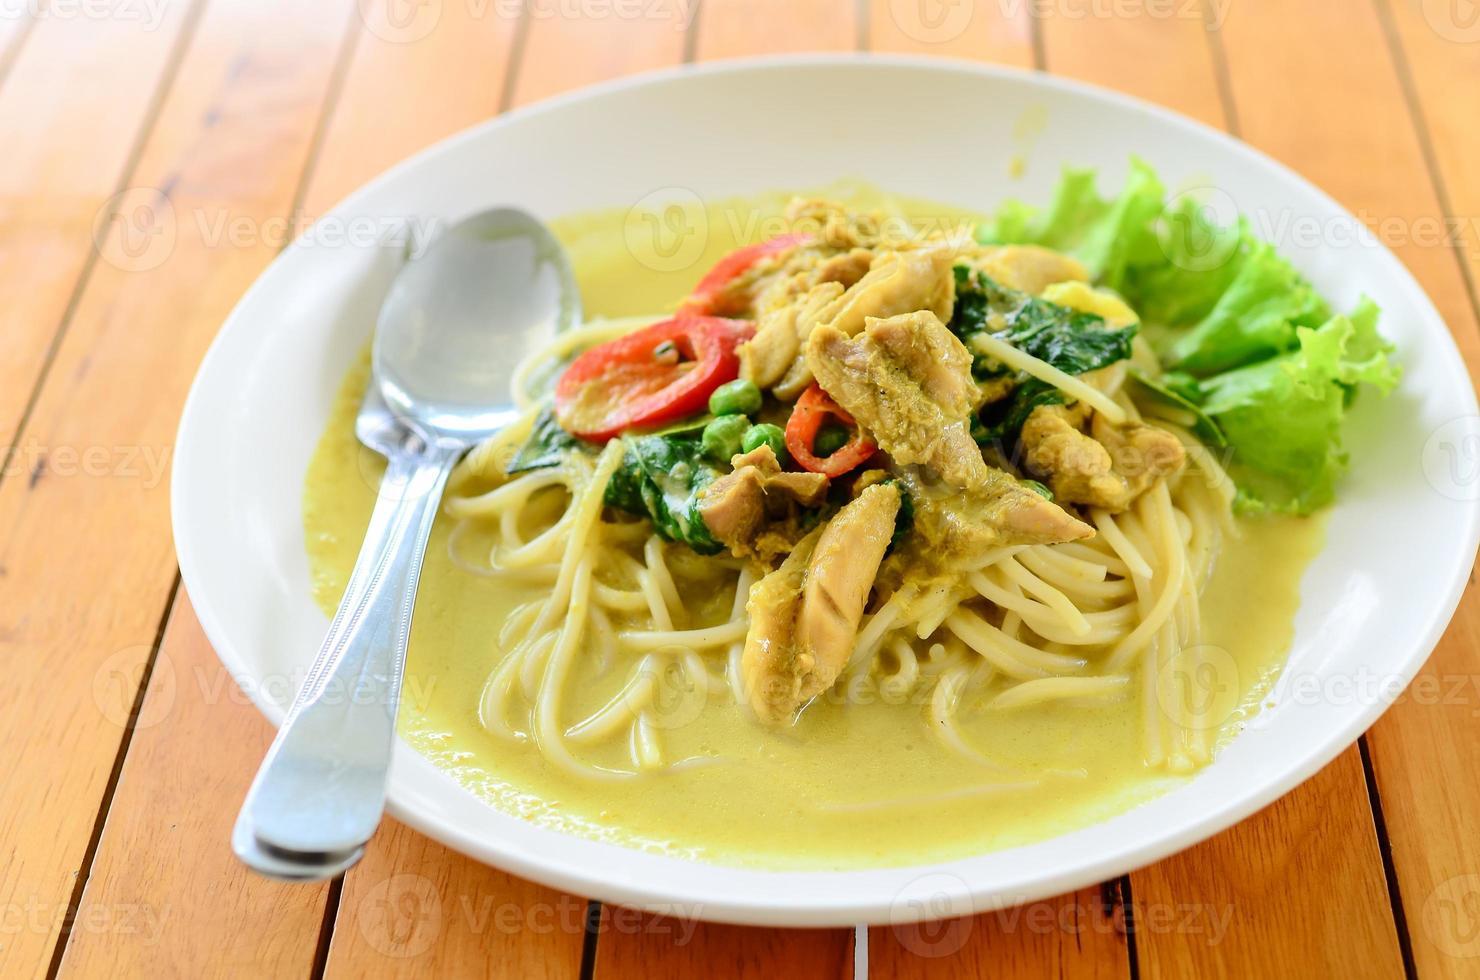 curry vert spaghetti sur table. photo